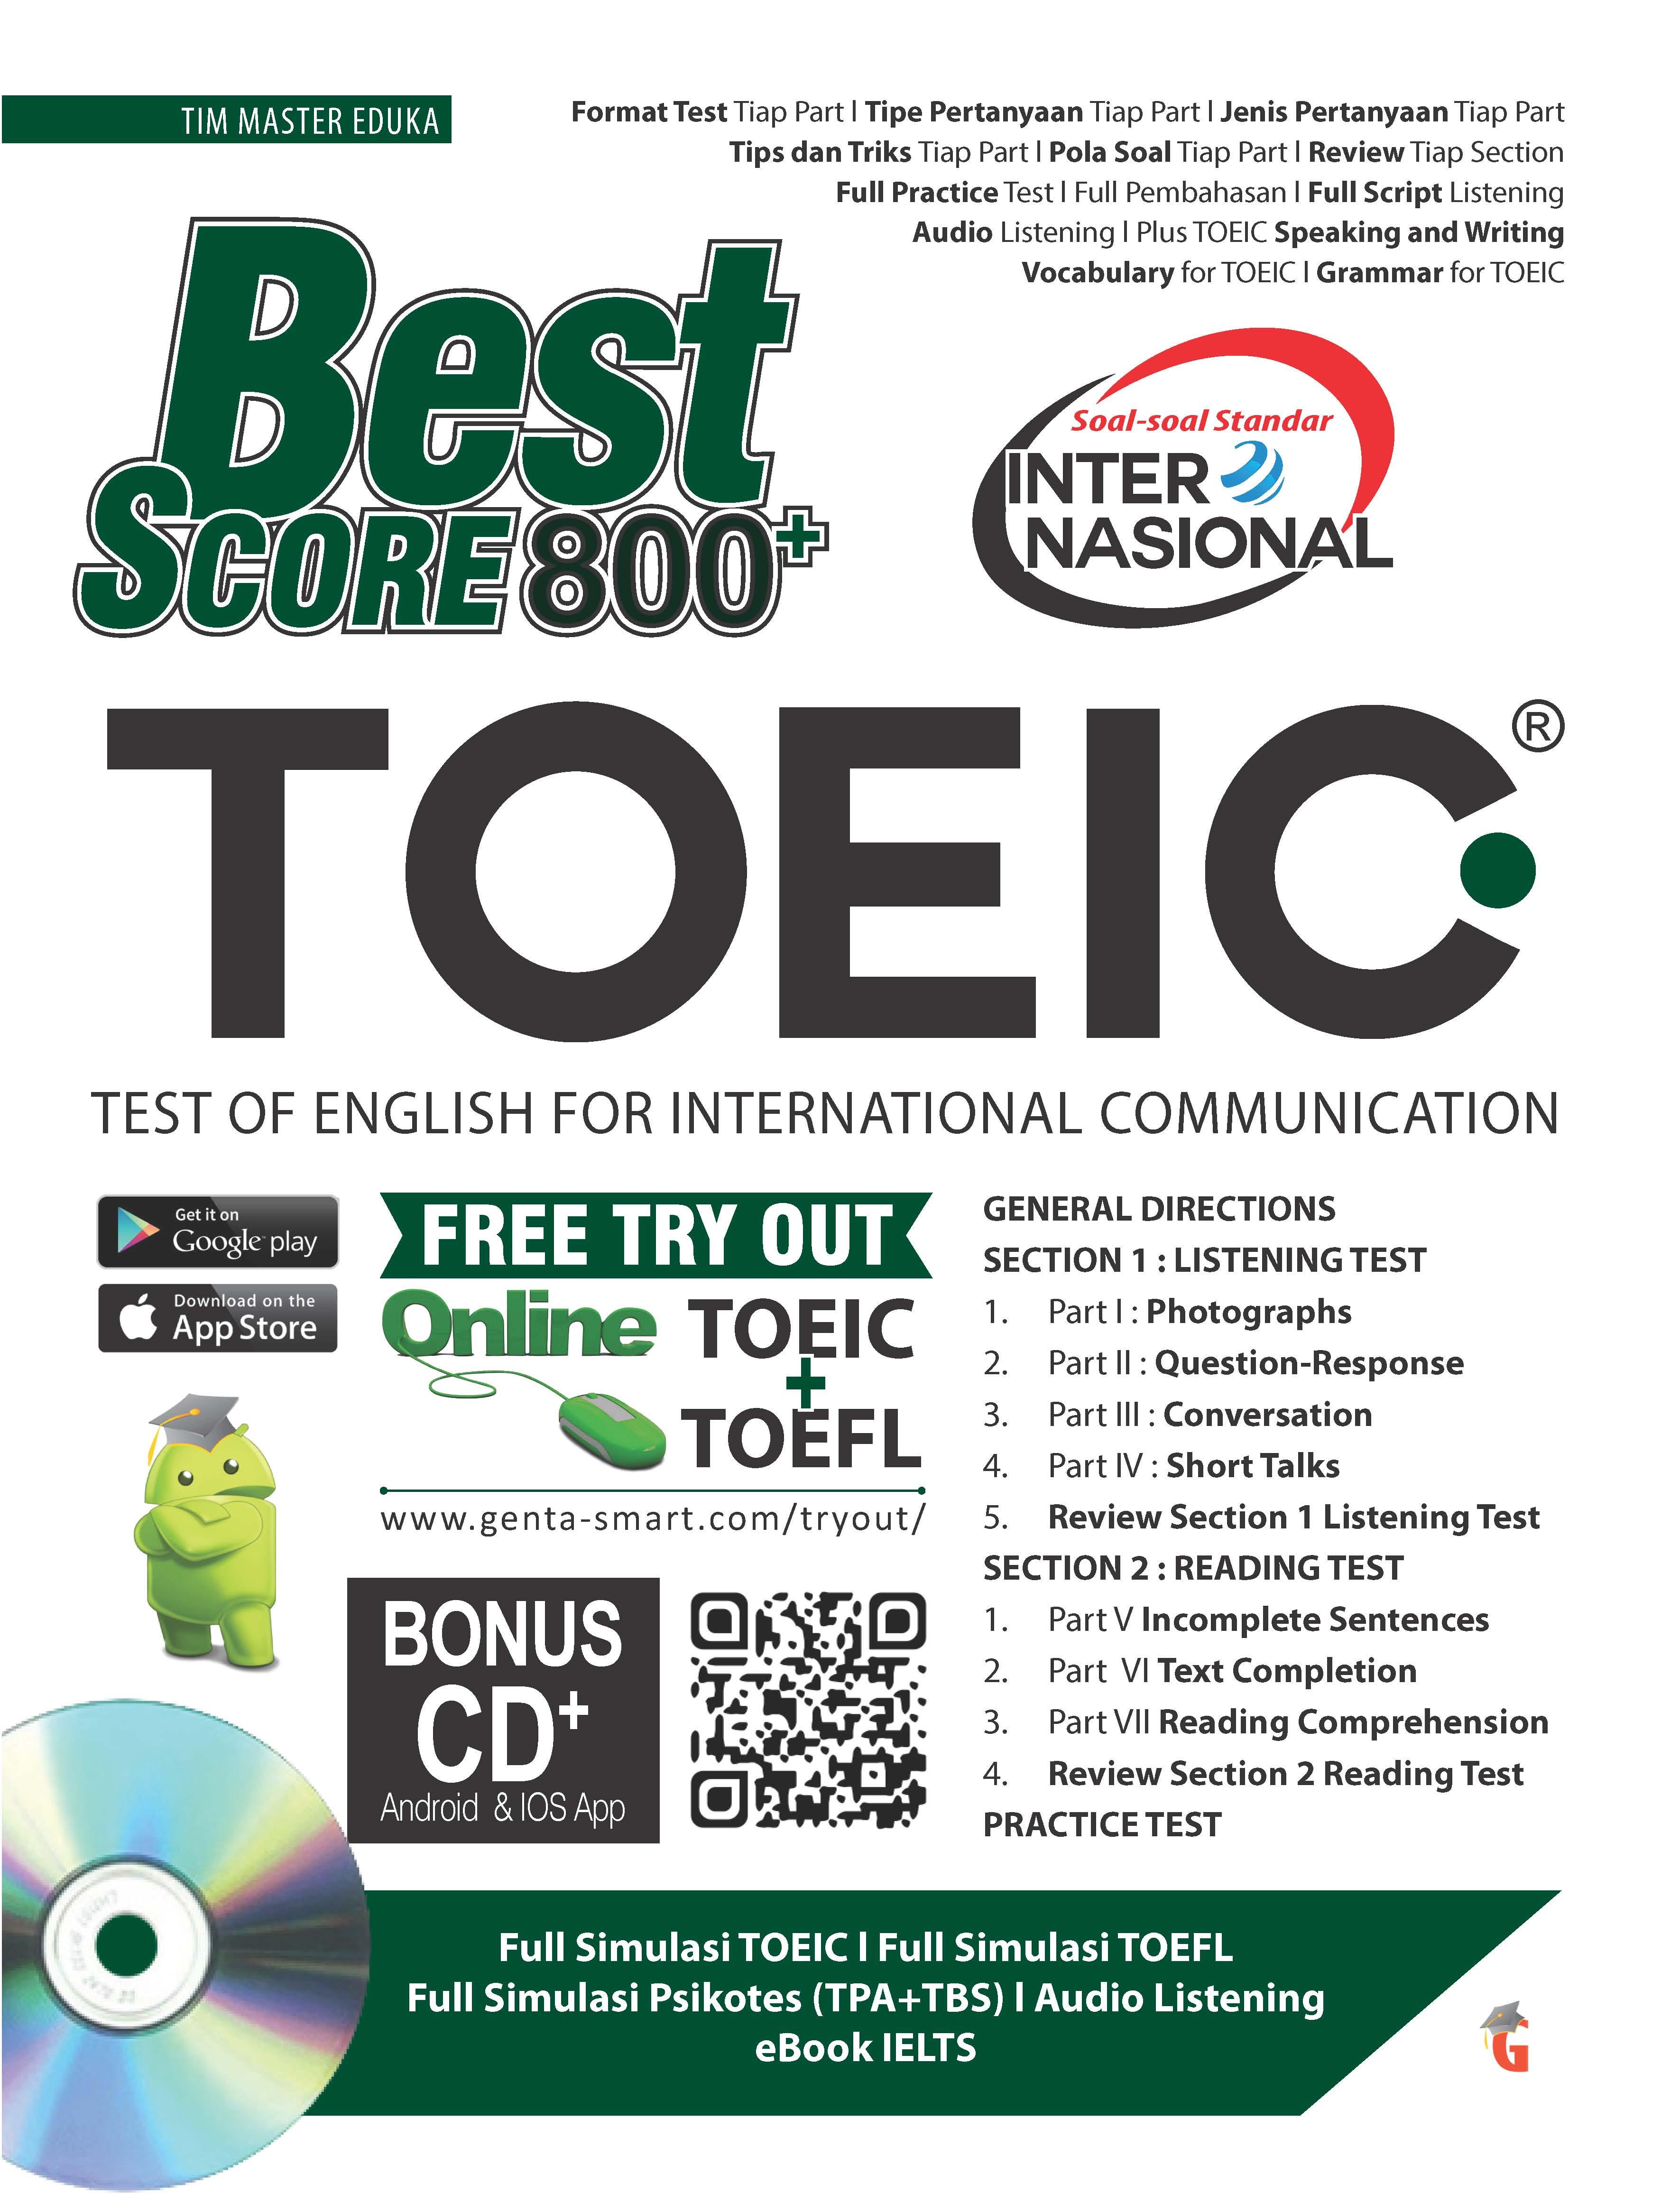 Best score TOEIC 800+ [sumber elektronis]